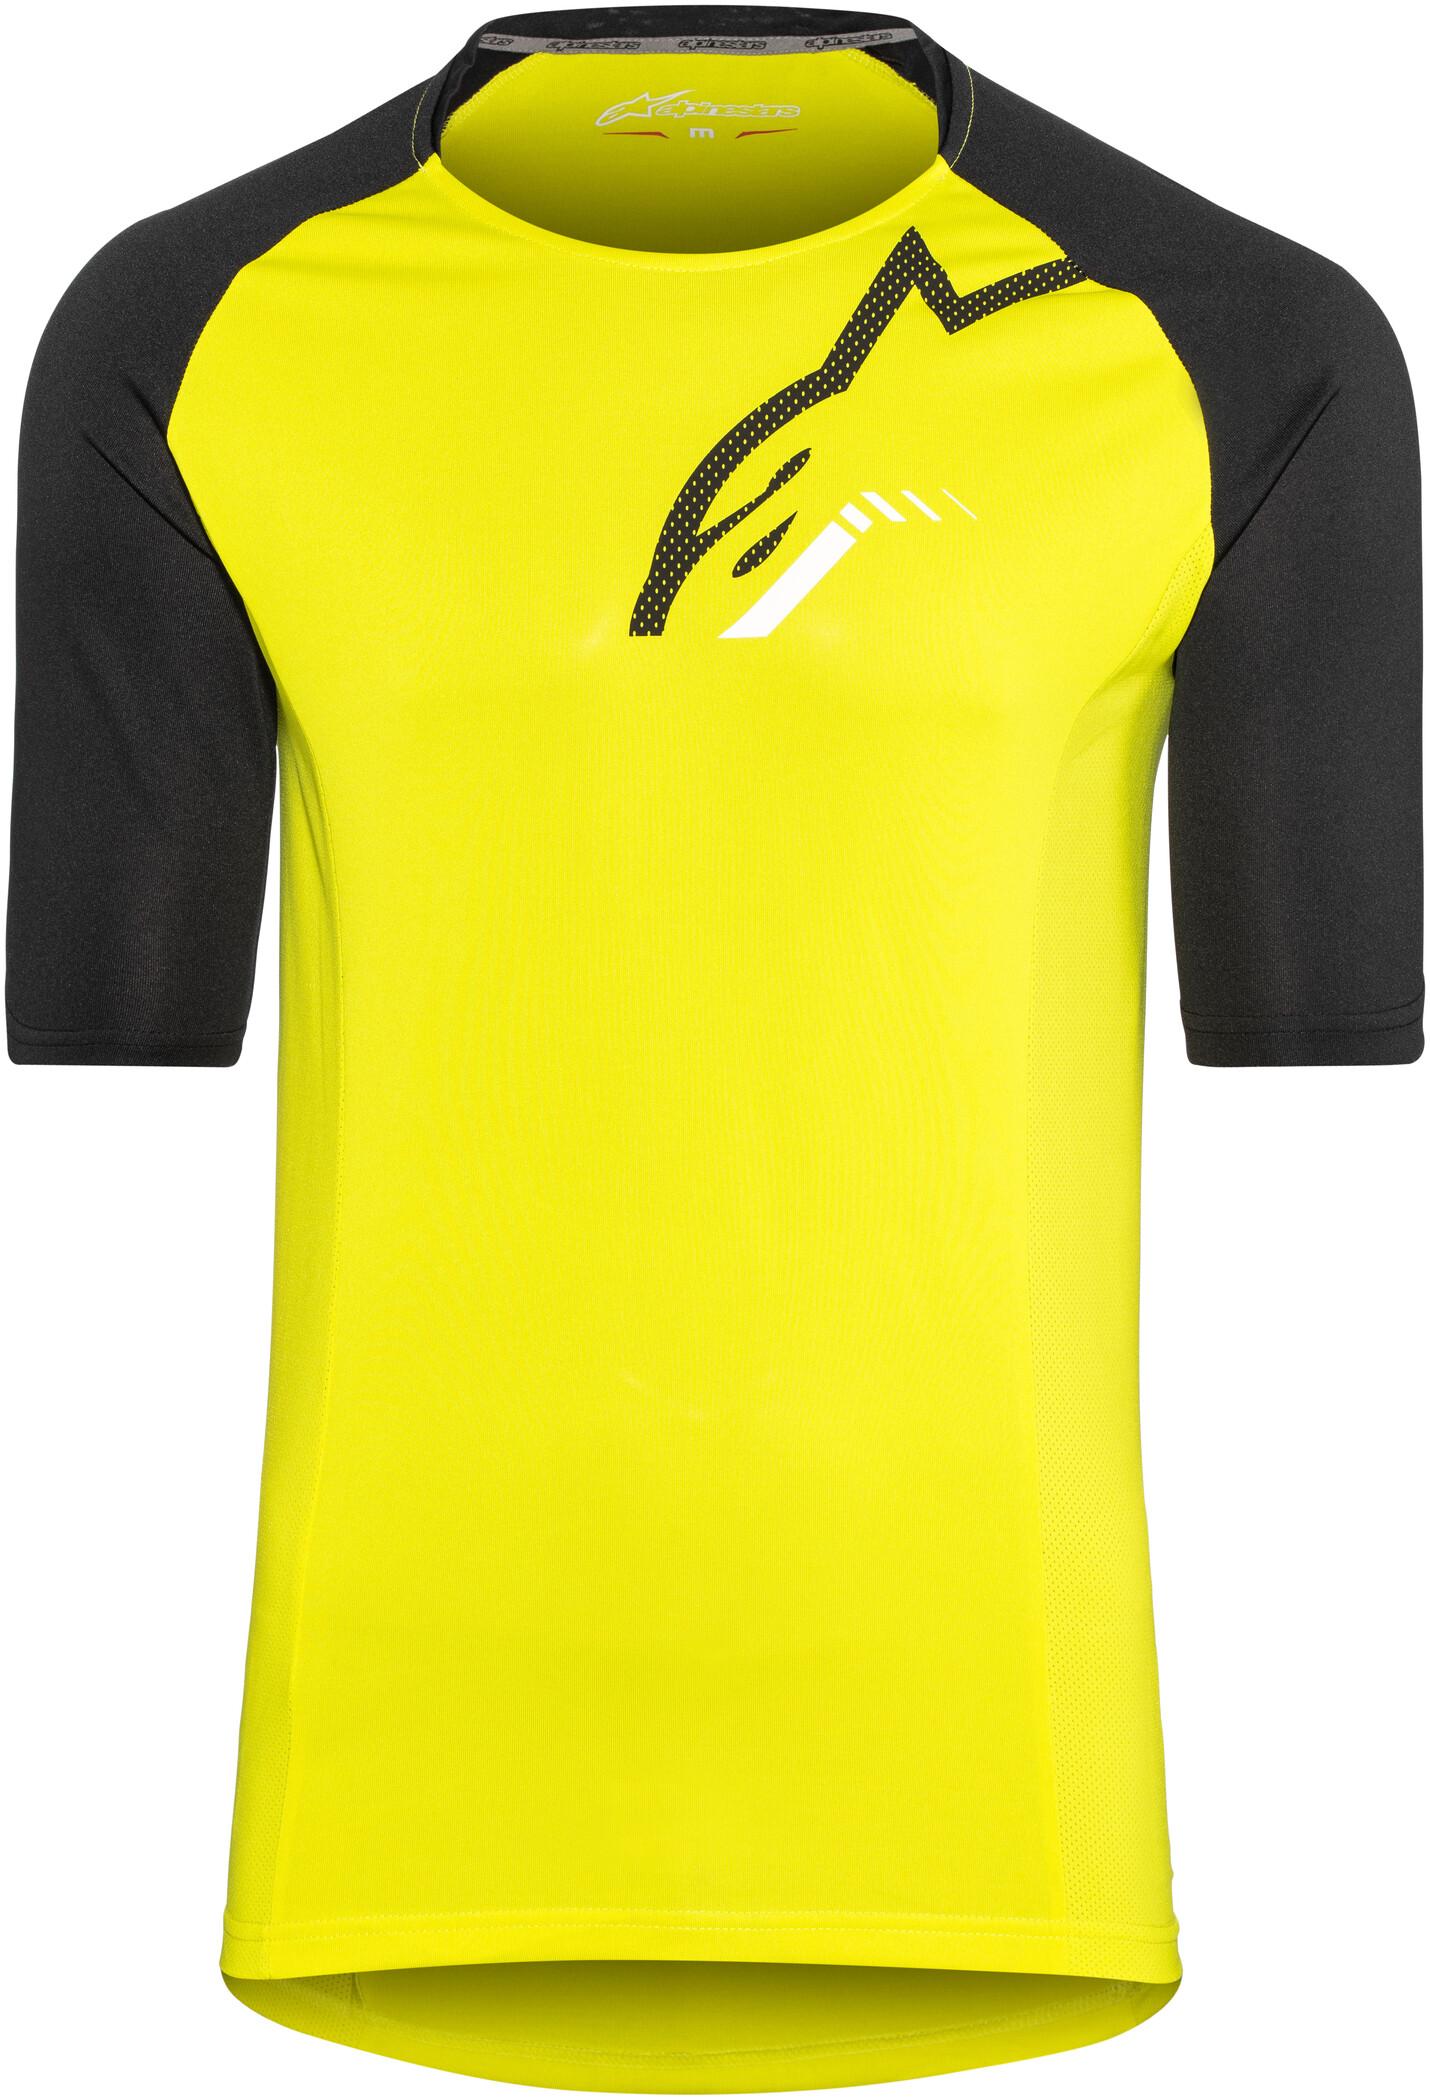 Alpinestars Trailstar Cykeltrøje Herrer, acid yellow/black (2019) | Jerseys